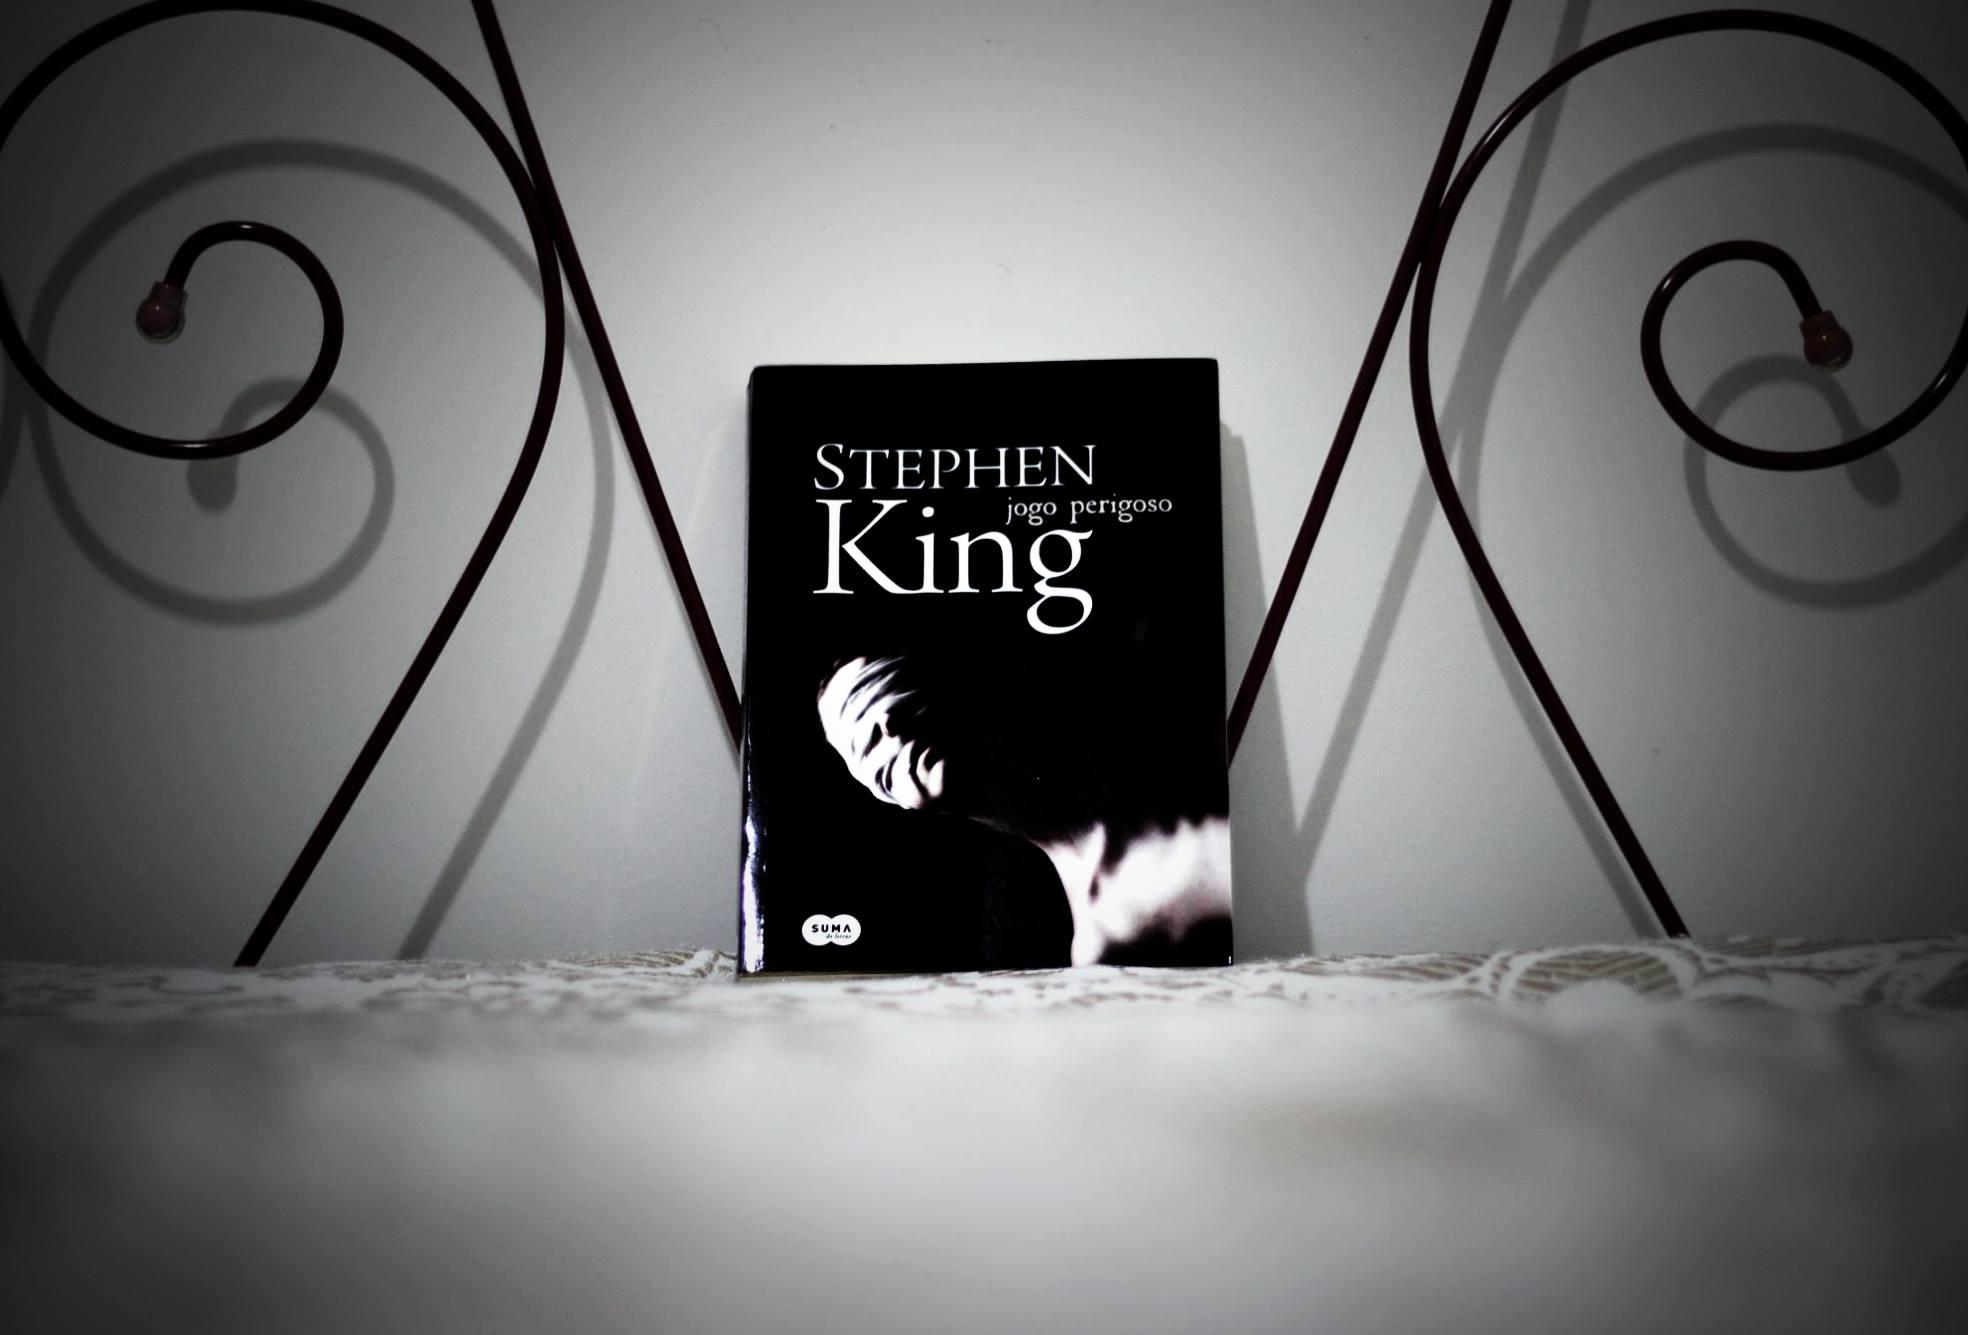 Resenha: Jogo Perigoso - Stephen King